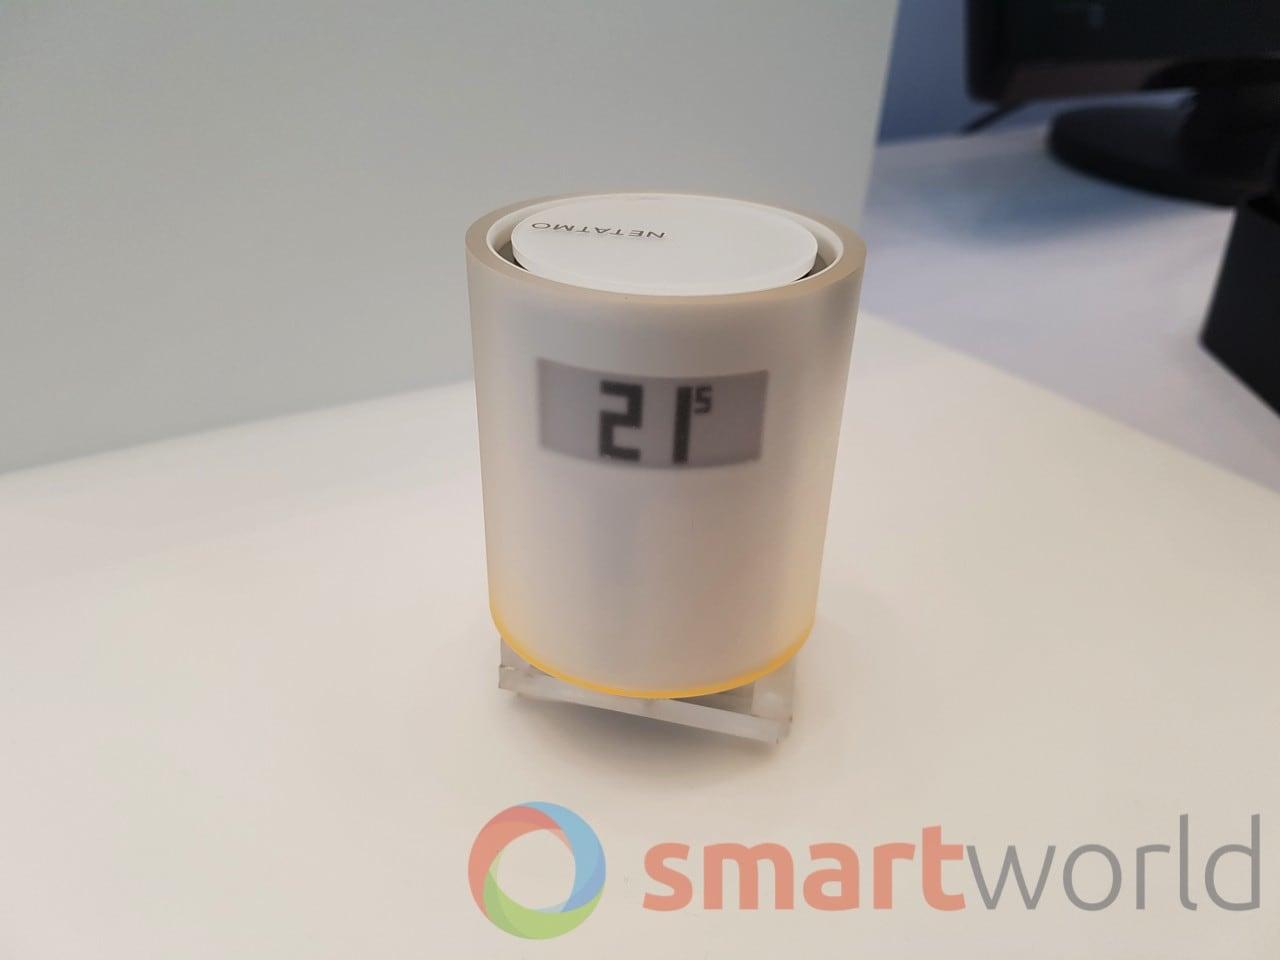 Netatmo presenta la termovalvola smart ifa berlino 2016 for Valvole termostatiche netatmo